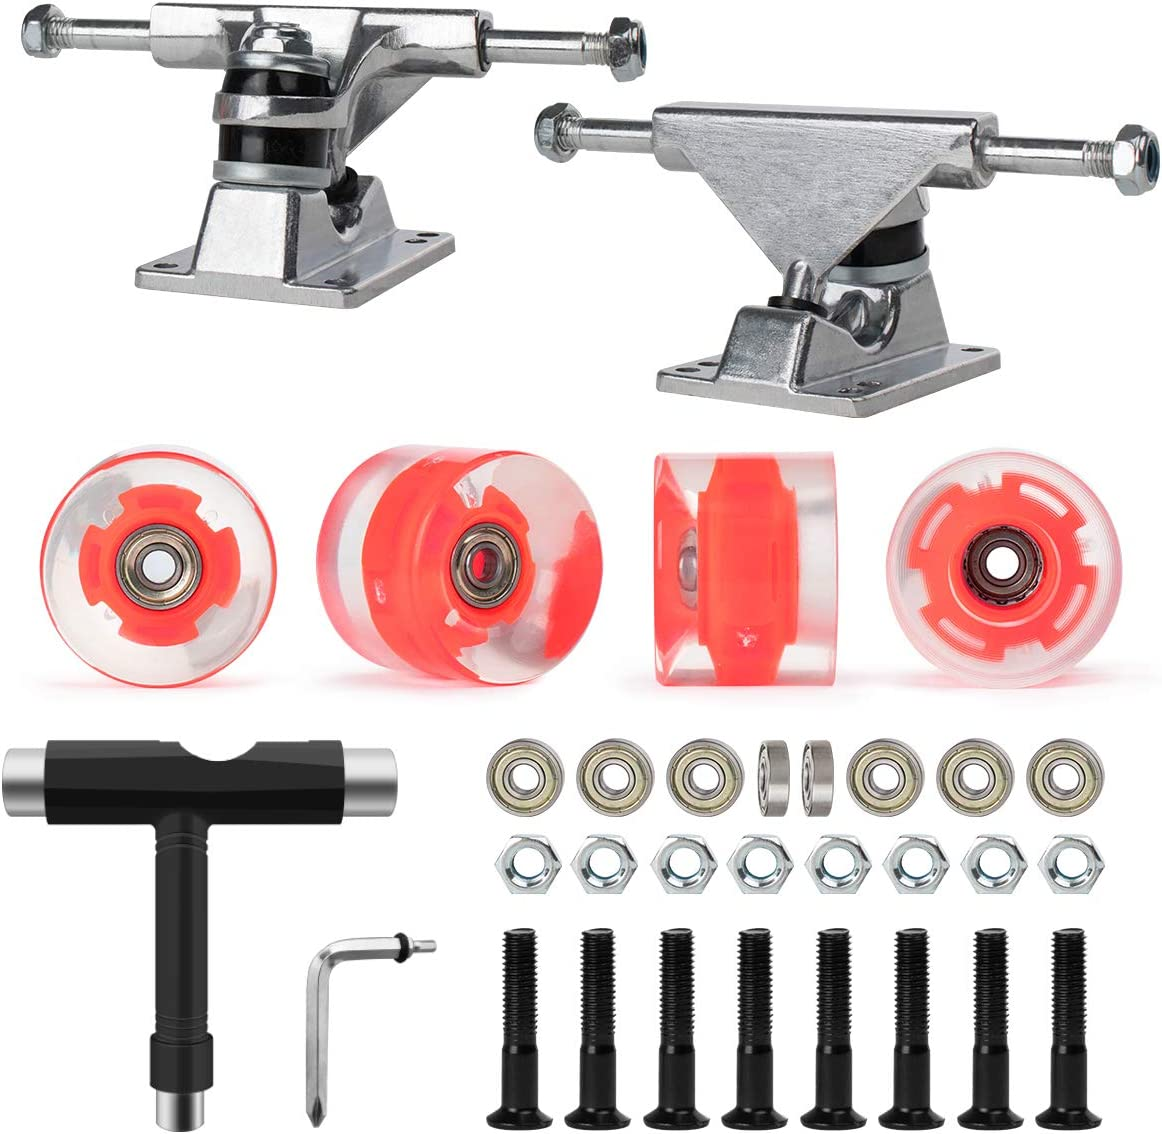 Max 65% OFF Nattork Skateboard Bearings 60mm Tr Wheels Max 46% OFF